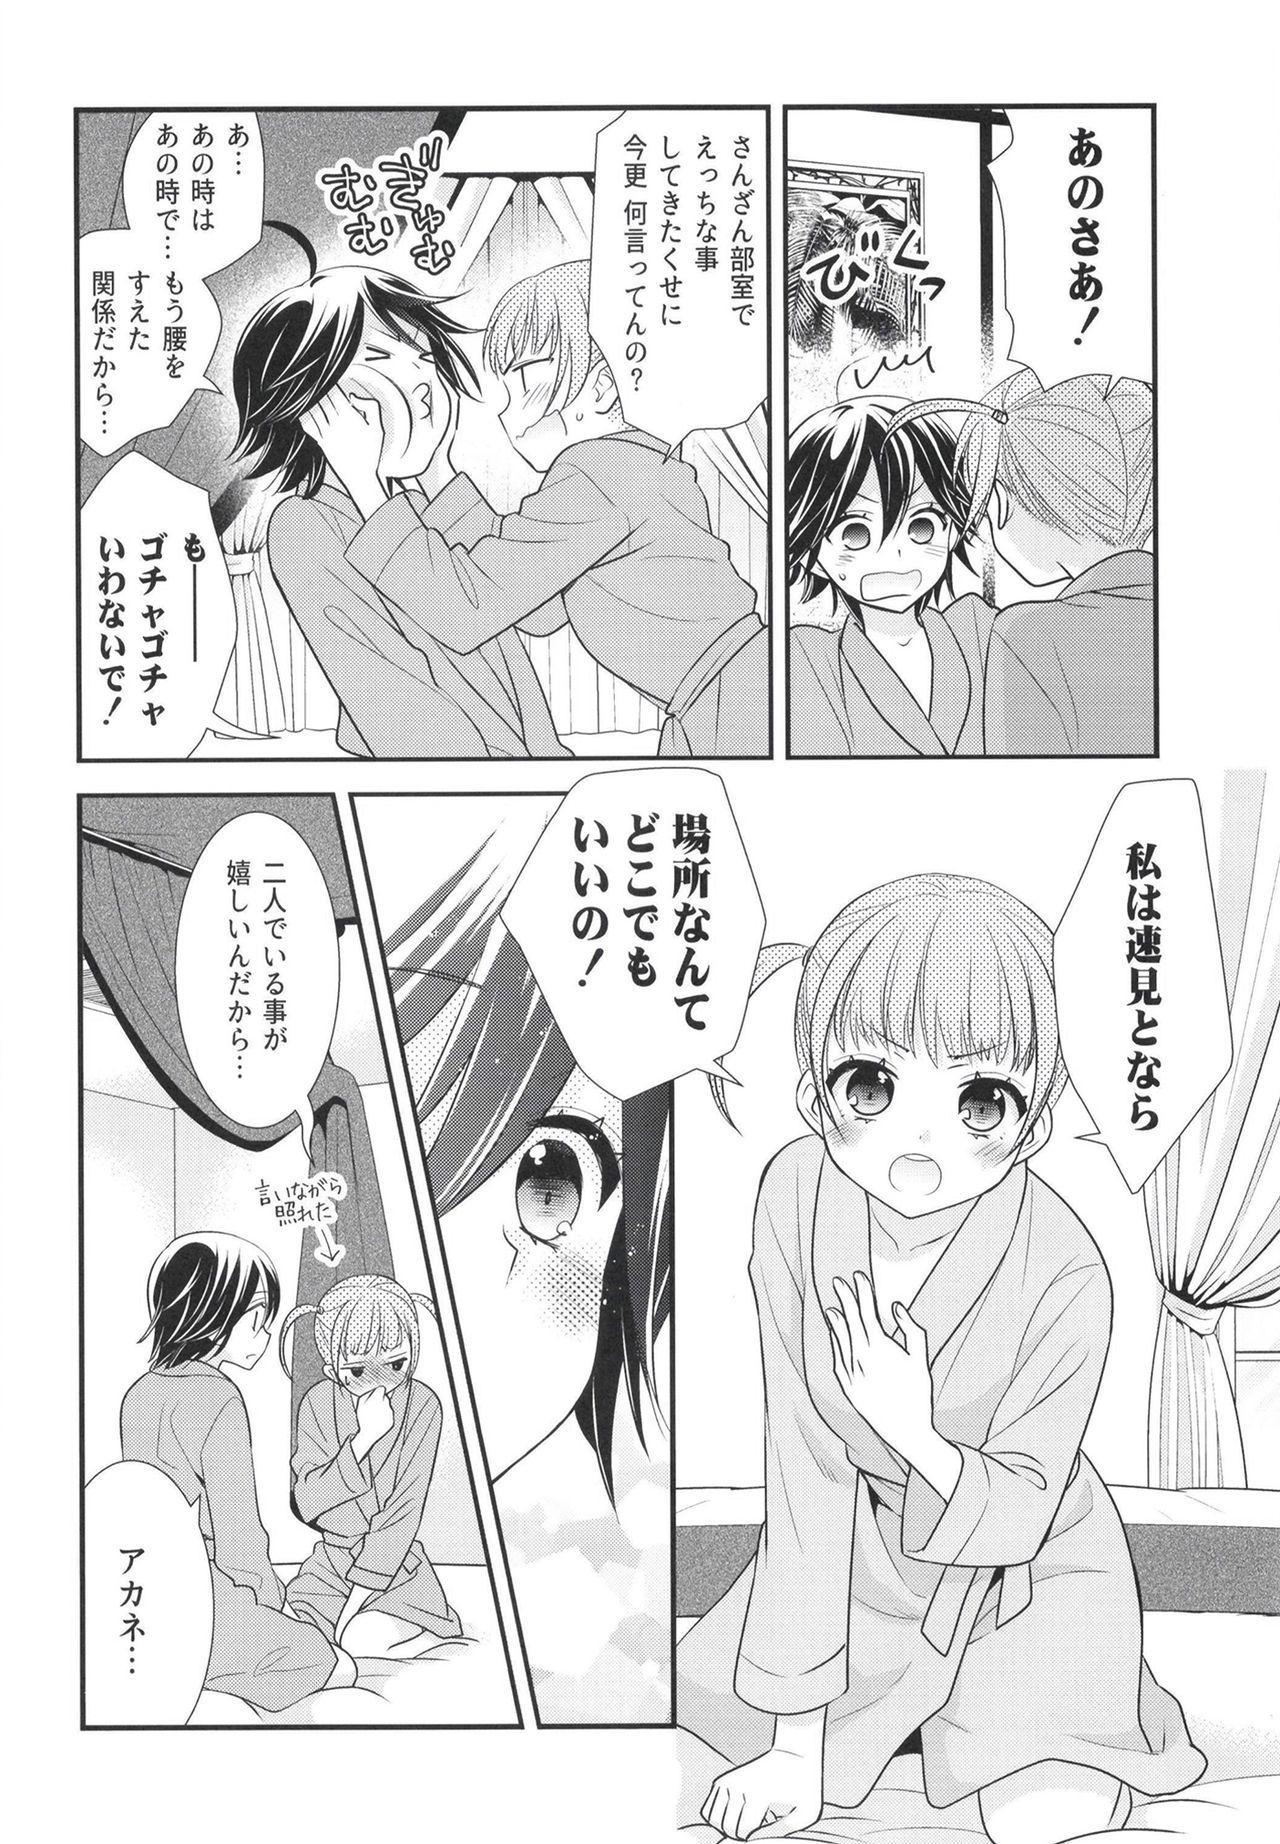 Sawarukara, Sawatte. 19